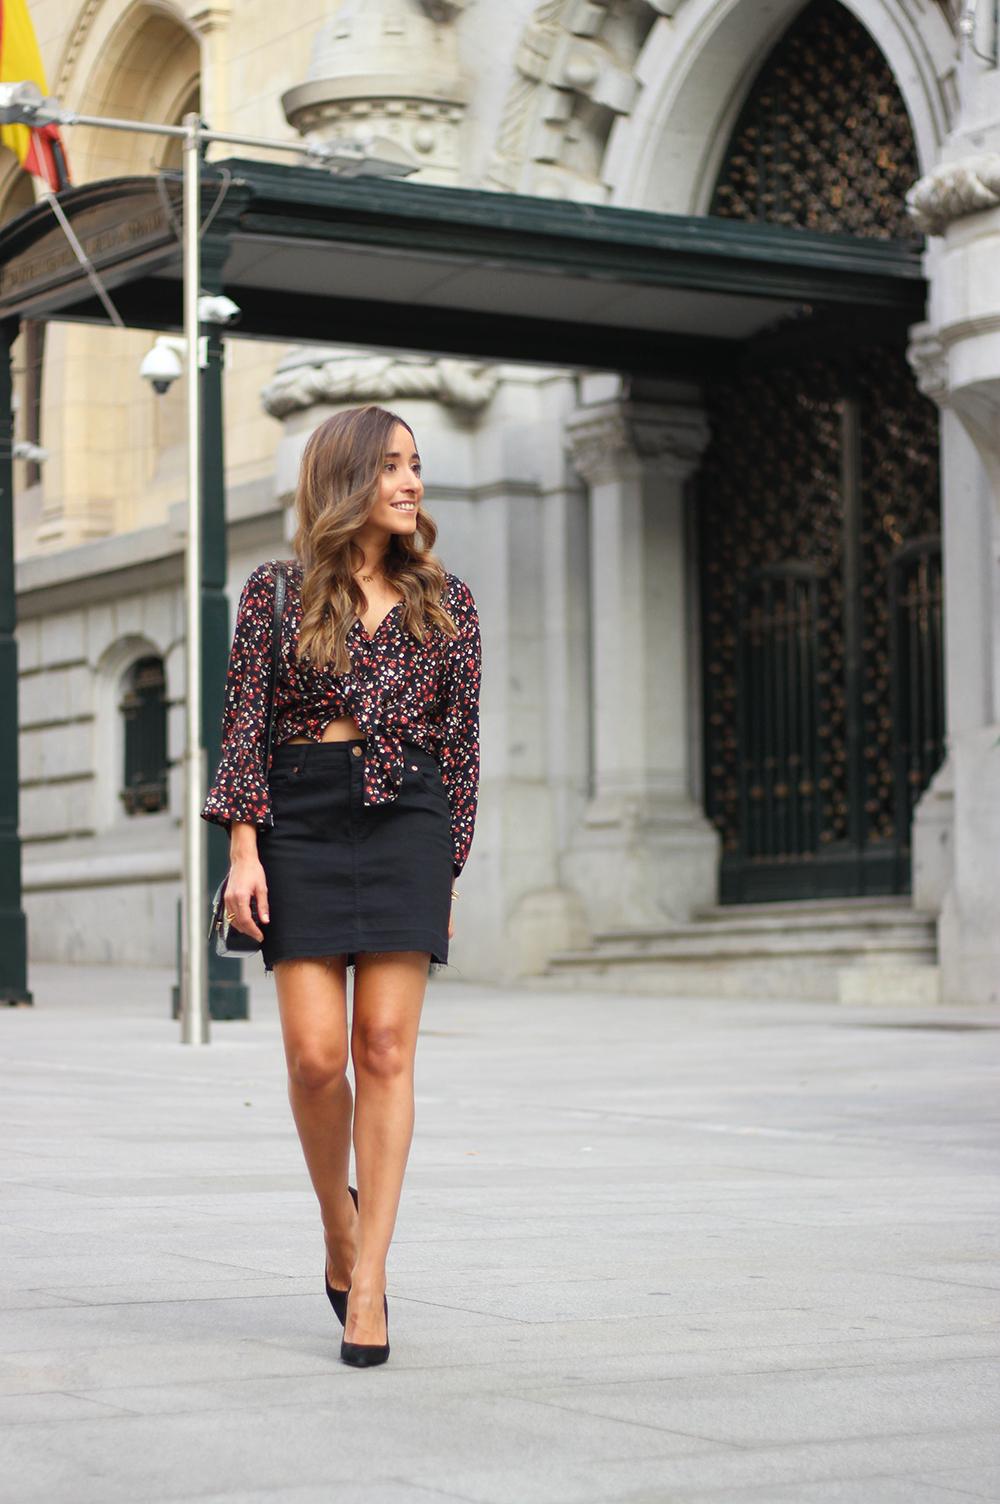 black flower shirt black denim skirt black heels givenchy bag autumn outfit street style 201806